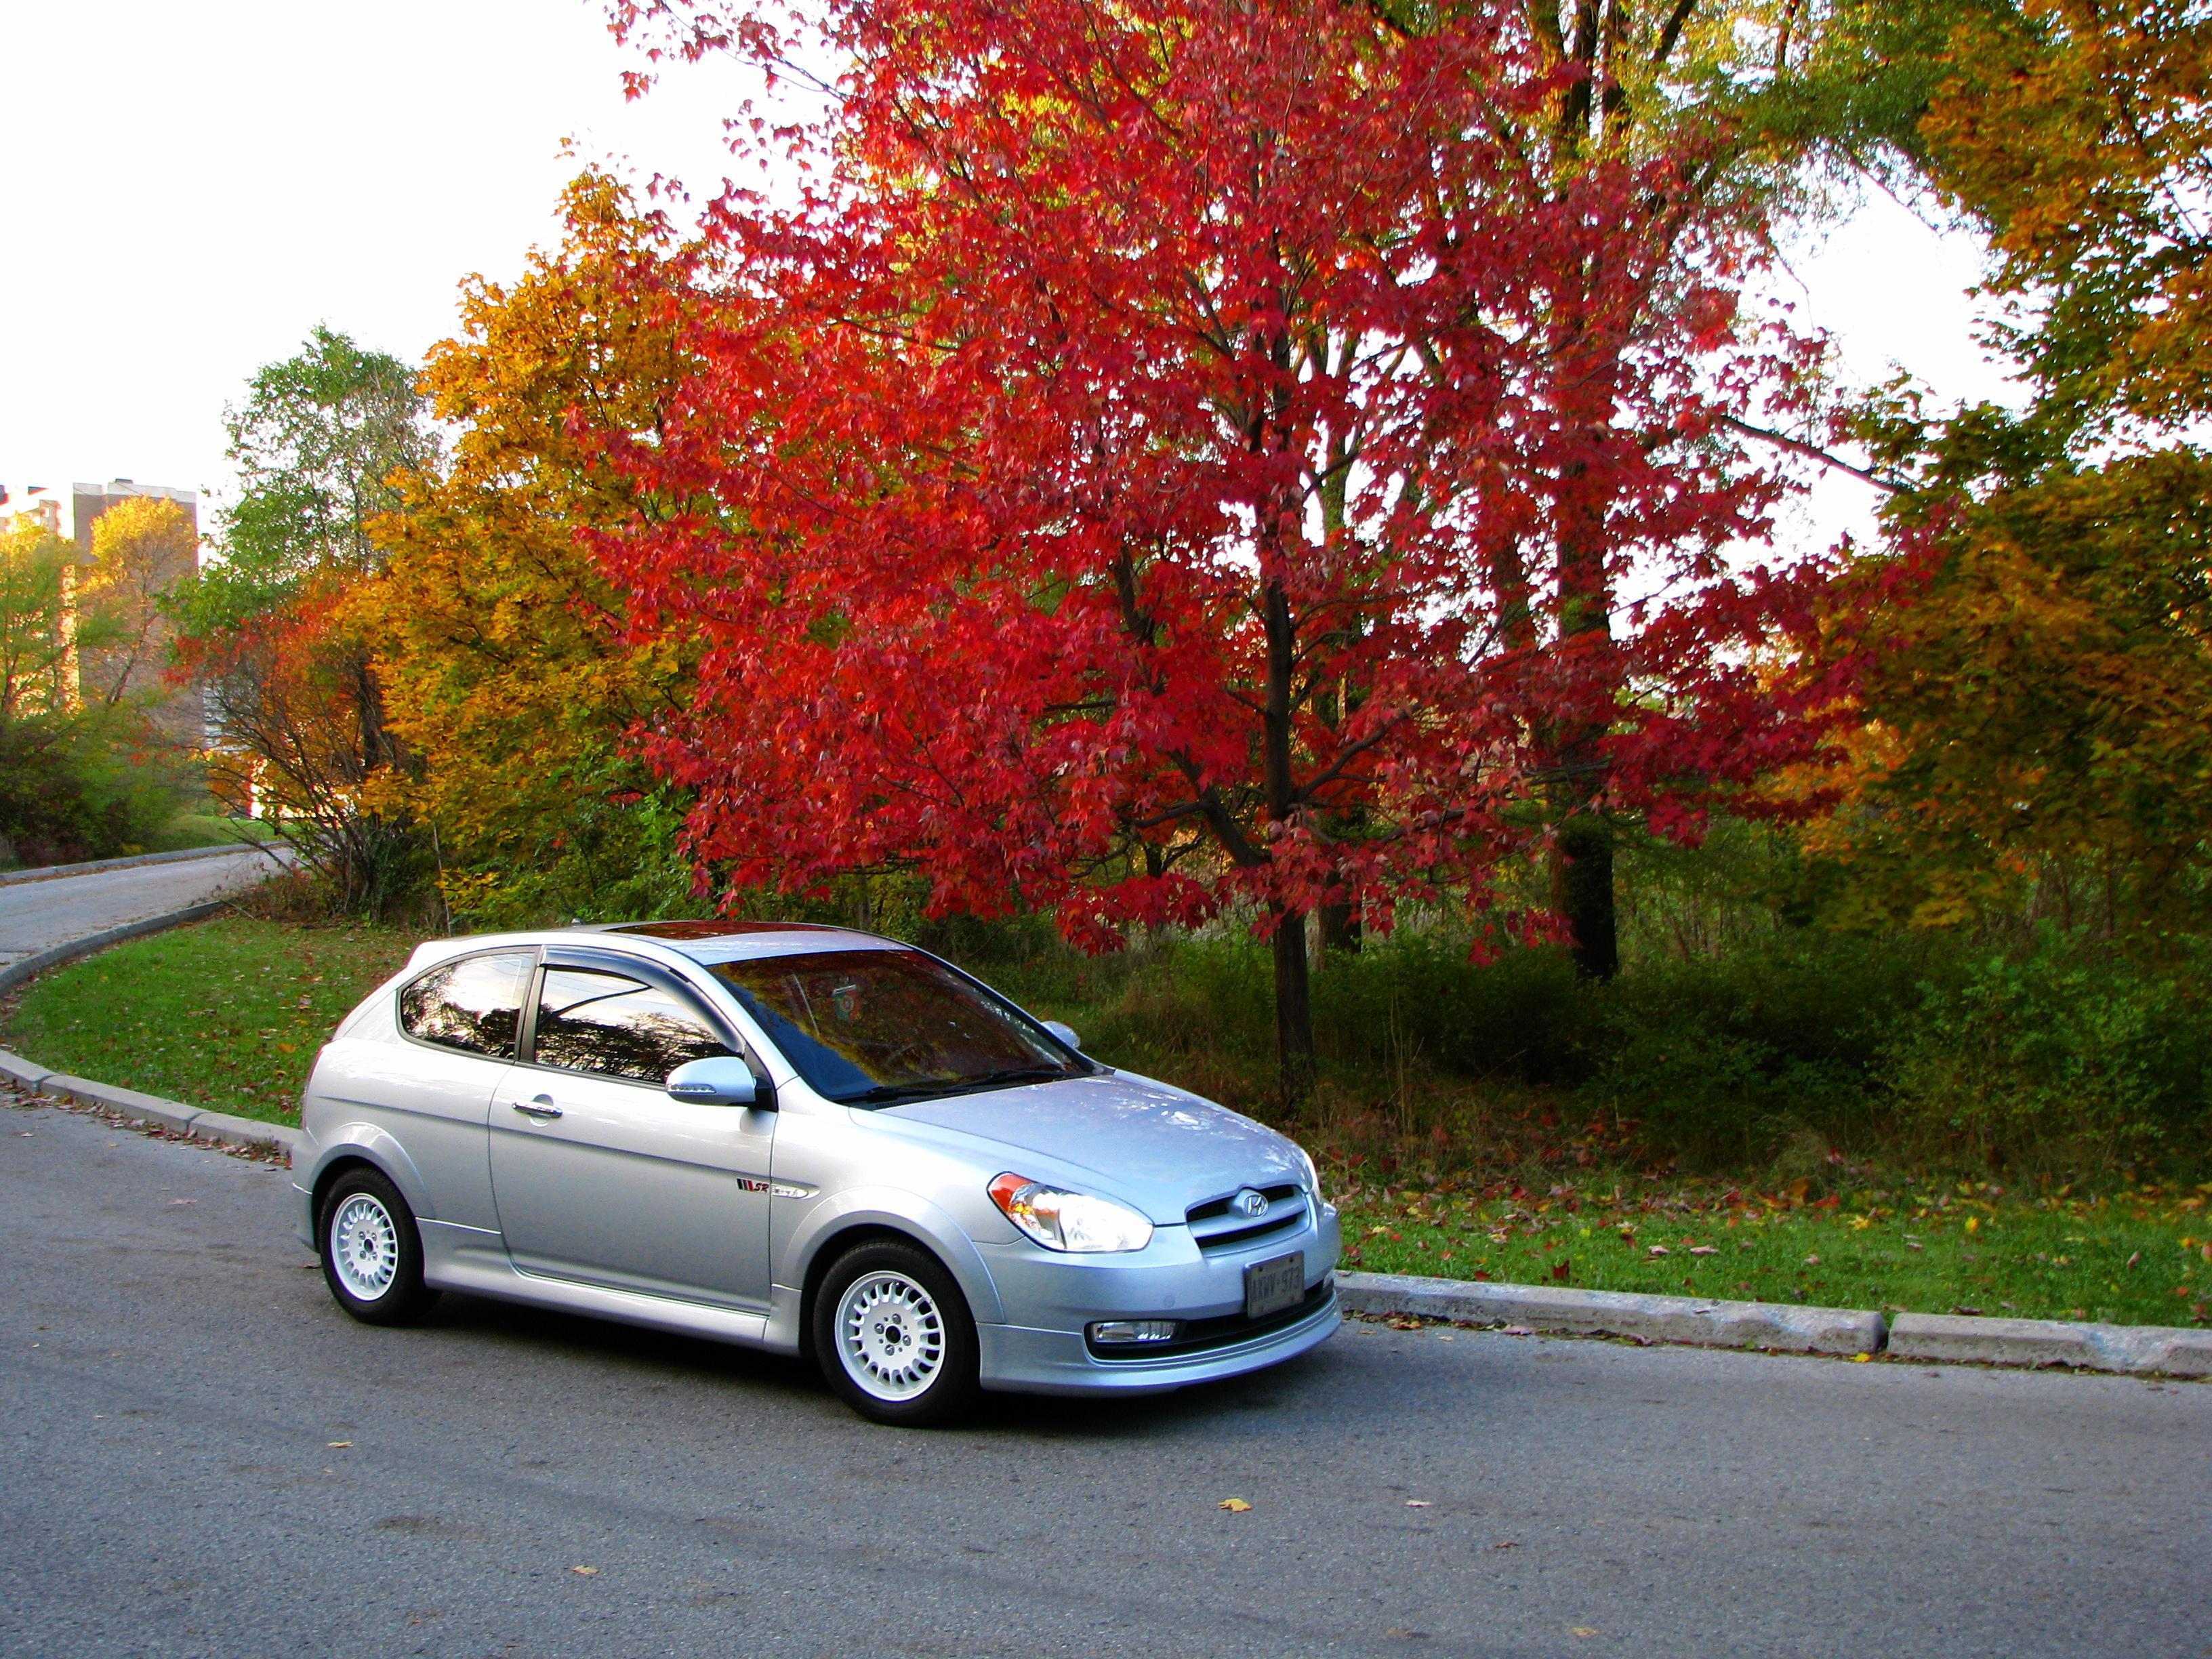 File Hyundai Accent Rally Car 4044443542 Jpg Wikimedia Commons